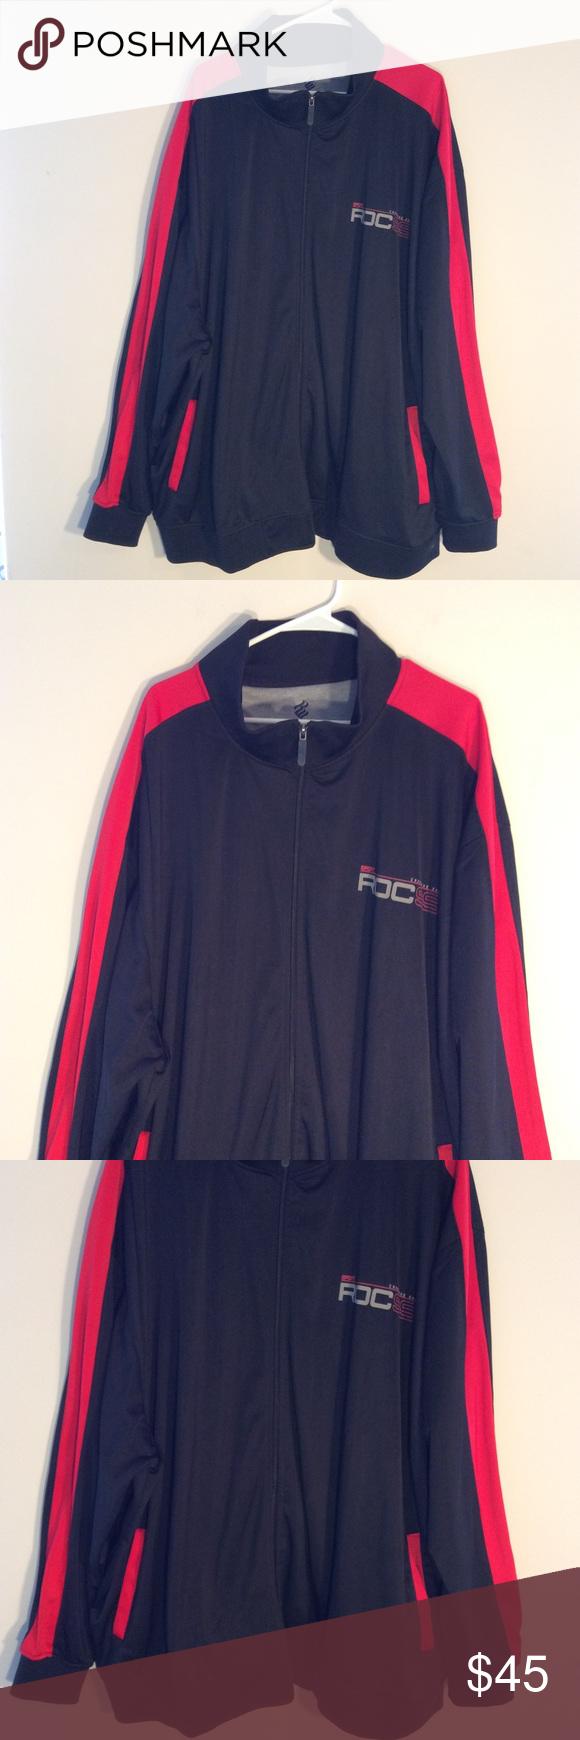 Men S Jacket Rocawear Size 5xl Clothes C Clothes Jackets Rocawear [ 1740 x 580 Pixel ]